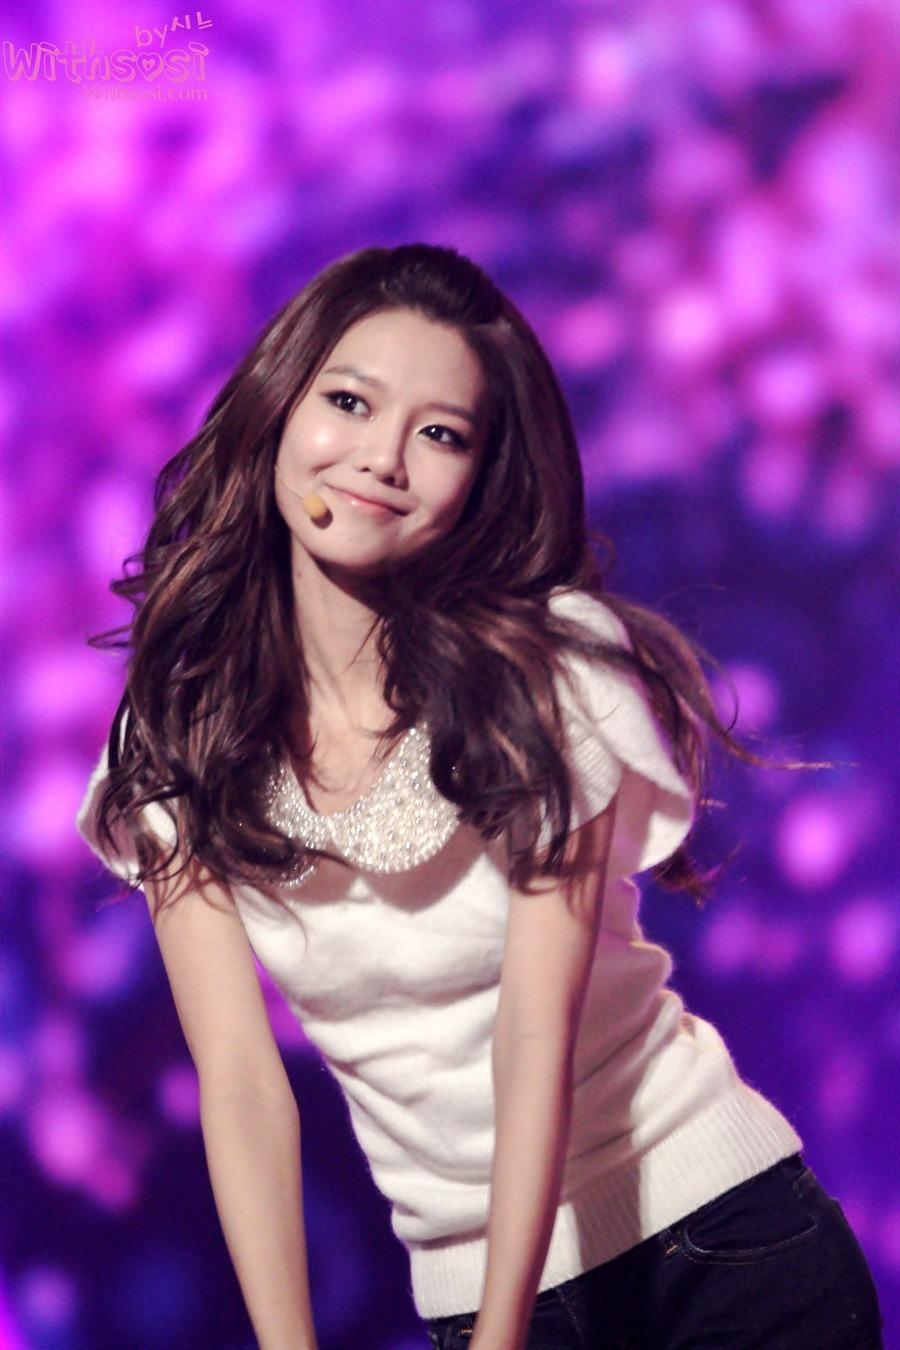 Sooyoung sooyoung @ kbs gayo daejun